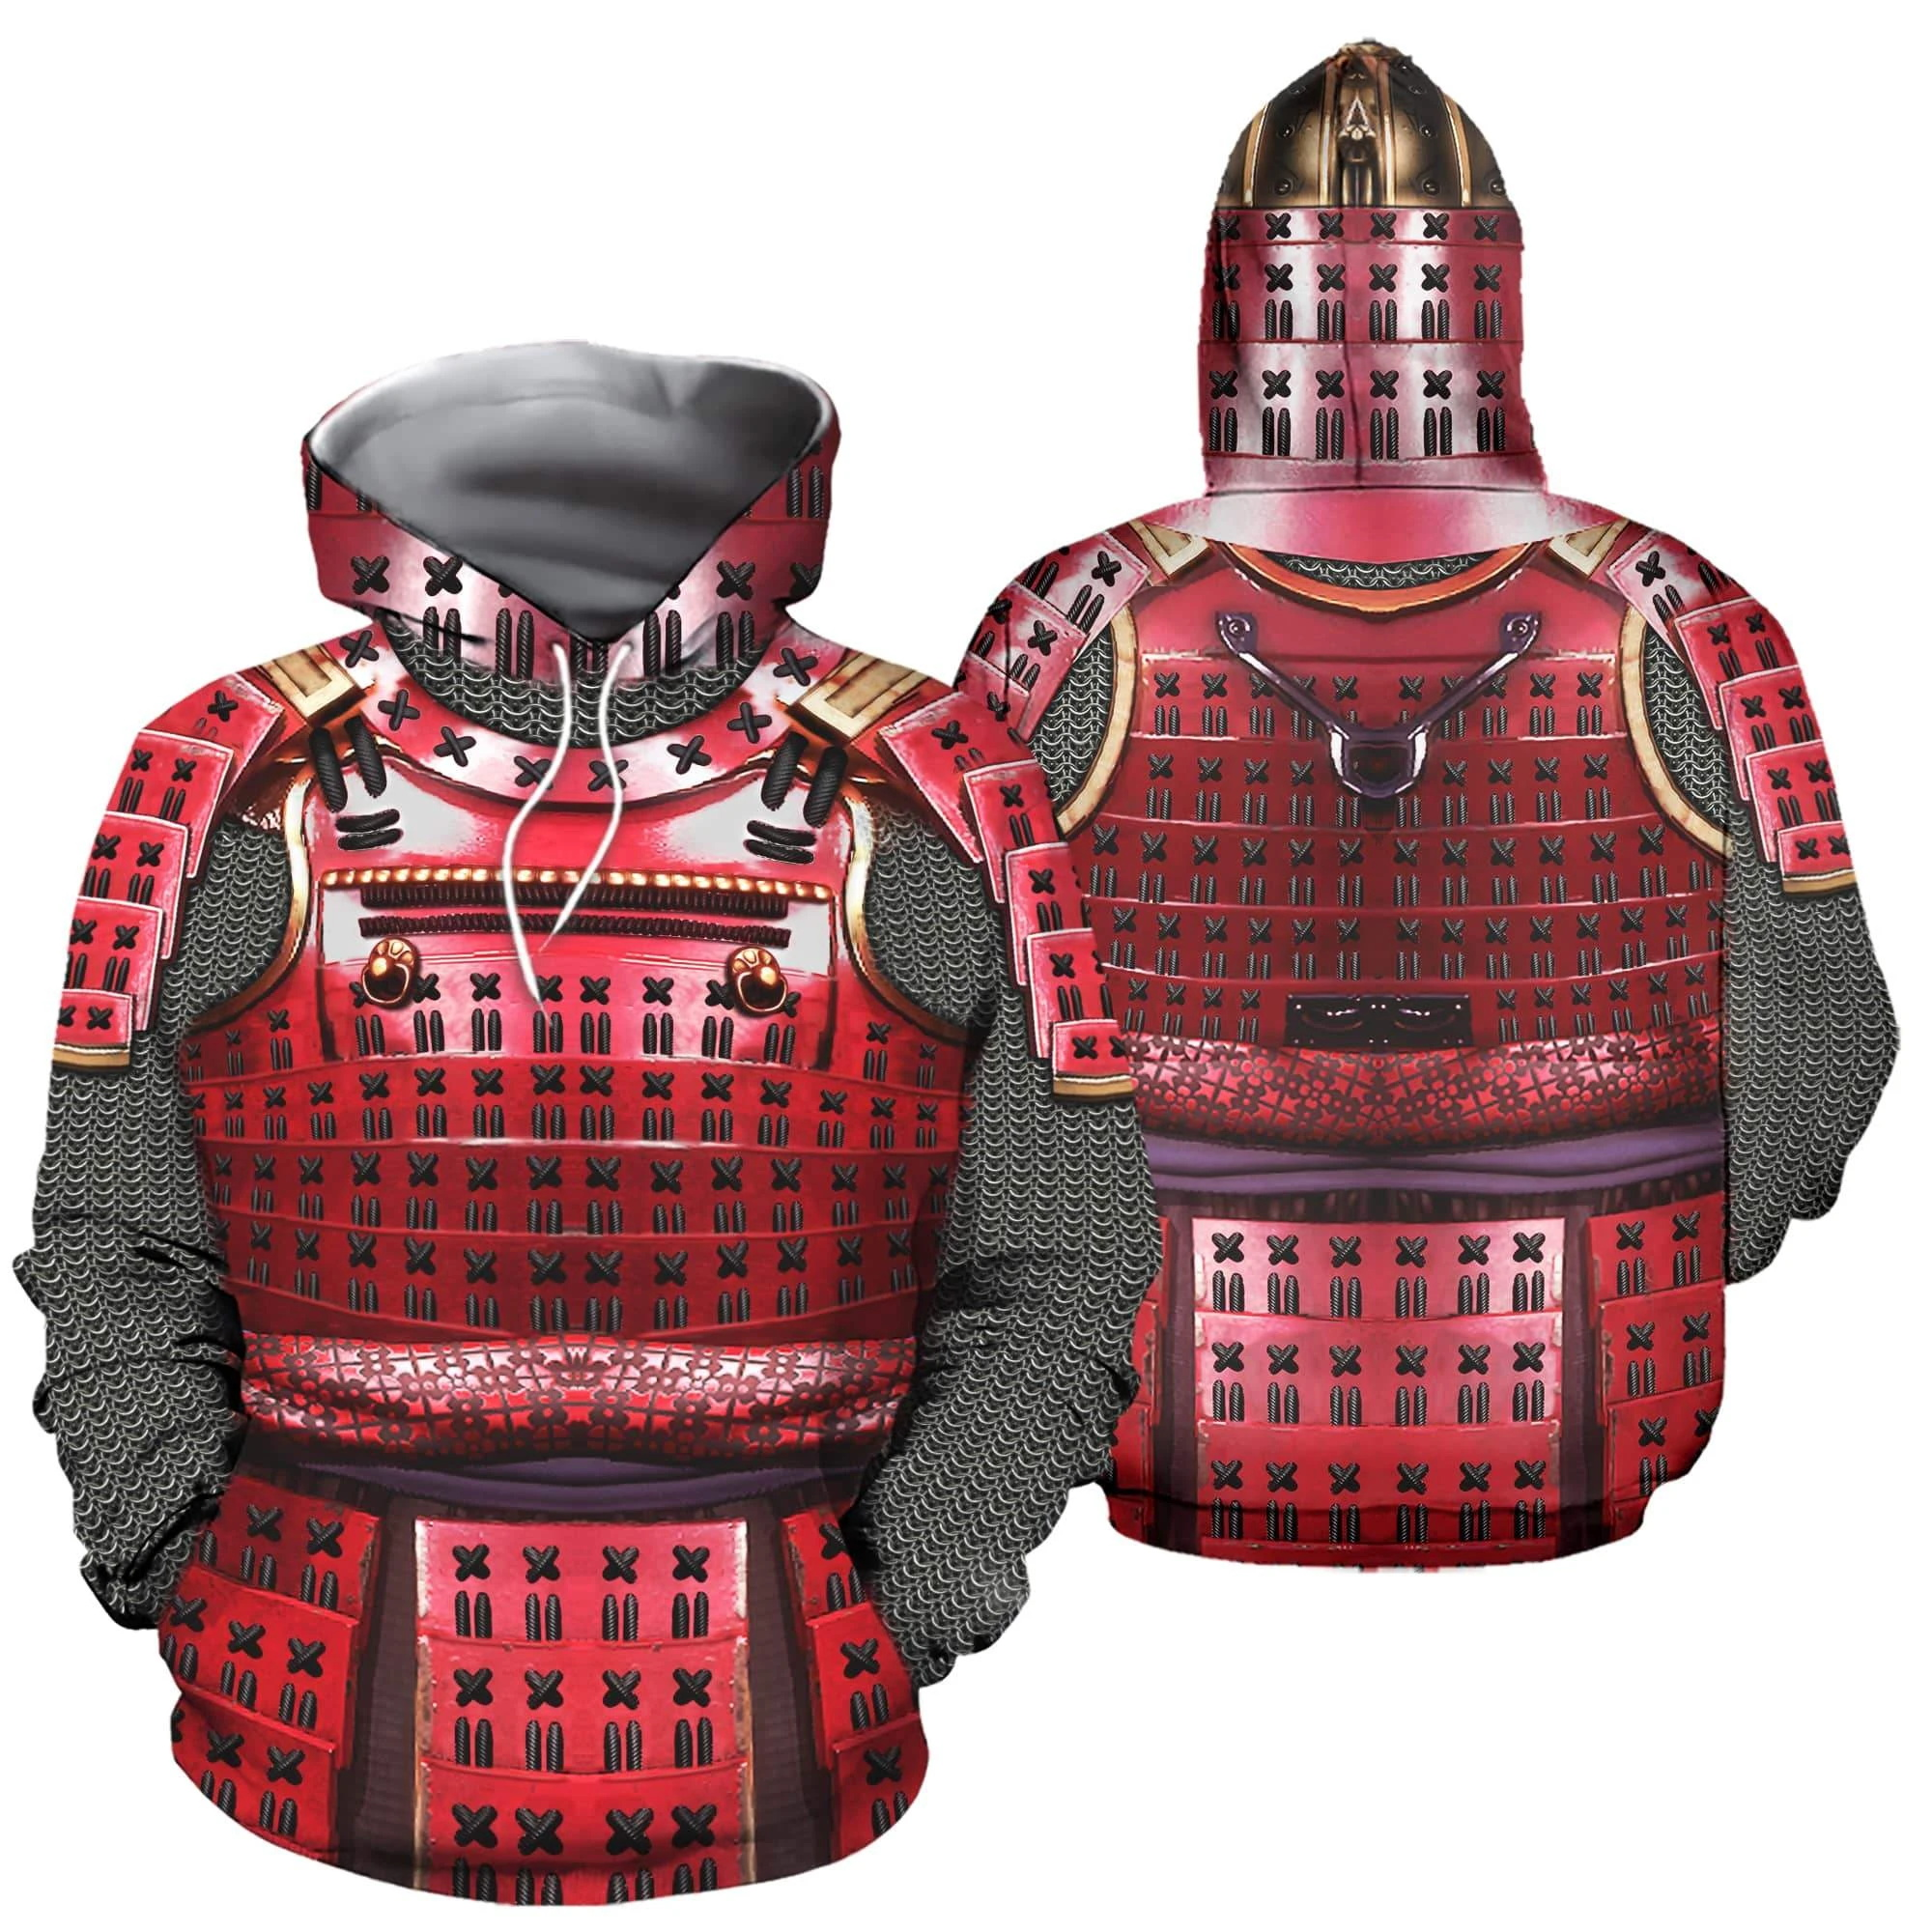 3D Printed Knight Medieval Armor Men Hoodies Knights Templar Harajuku Fashion Hooded Sweatshirt Unisex Casual Jacket Hoodie QS99